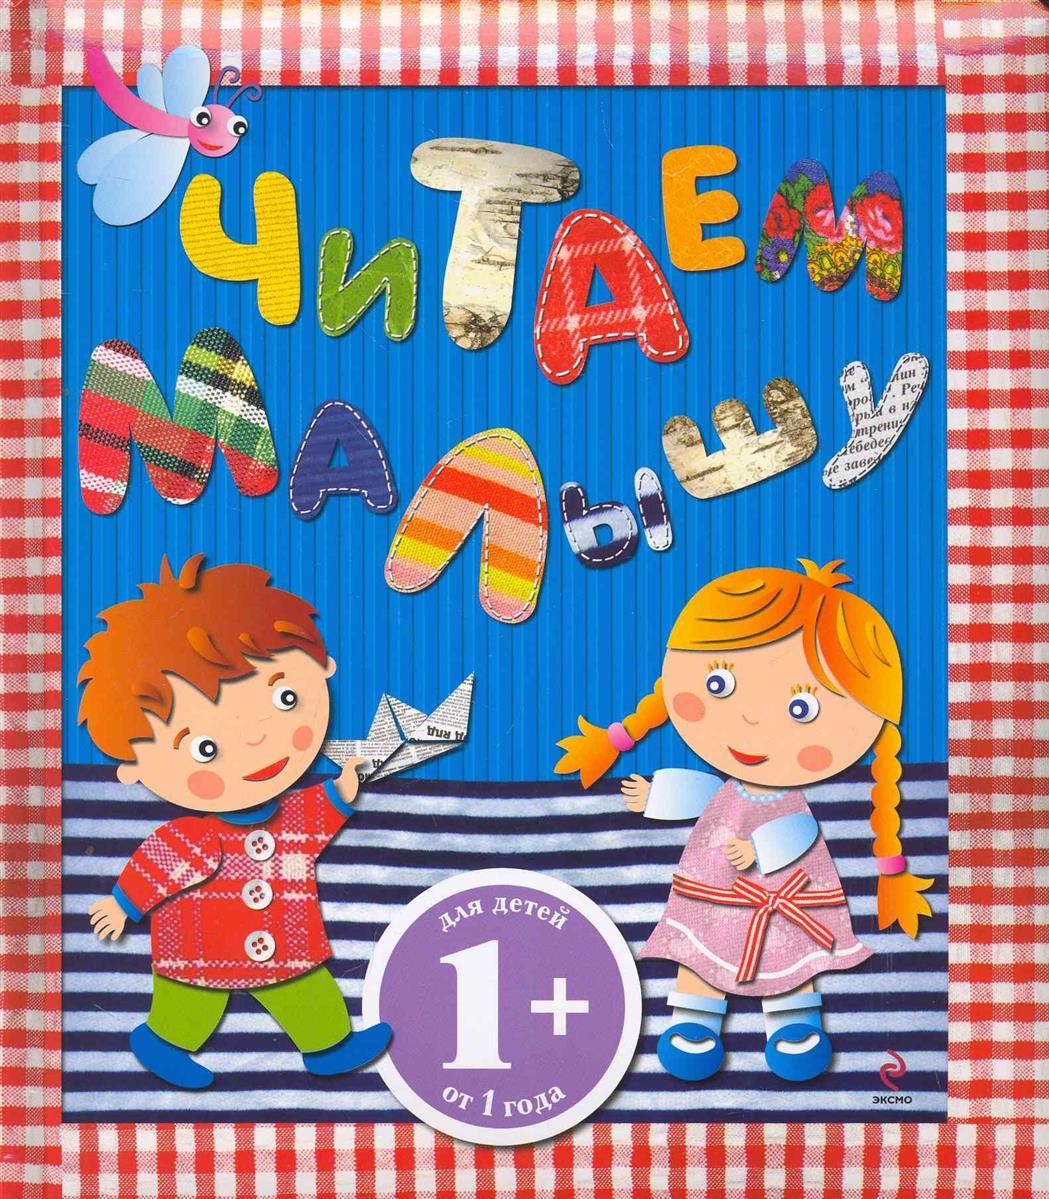 Верзун Д., Ситникова Т. (худ.) Читаем малышу